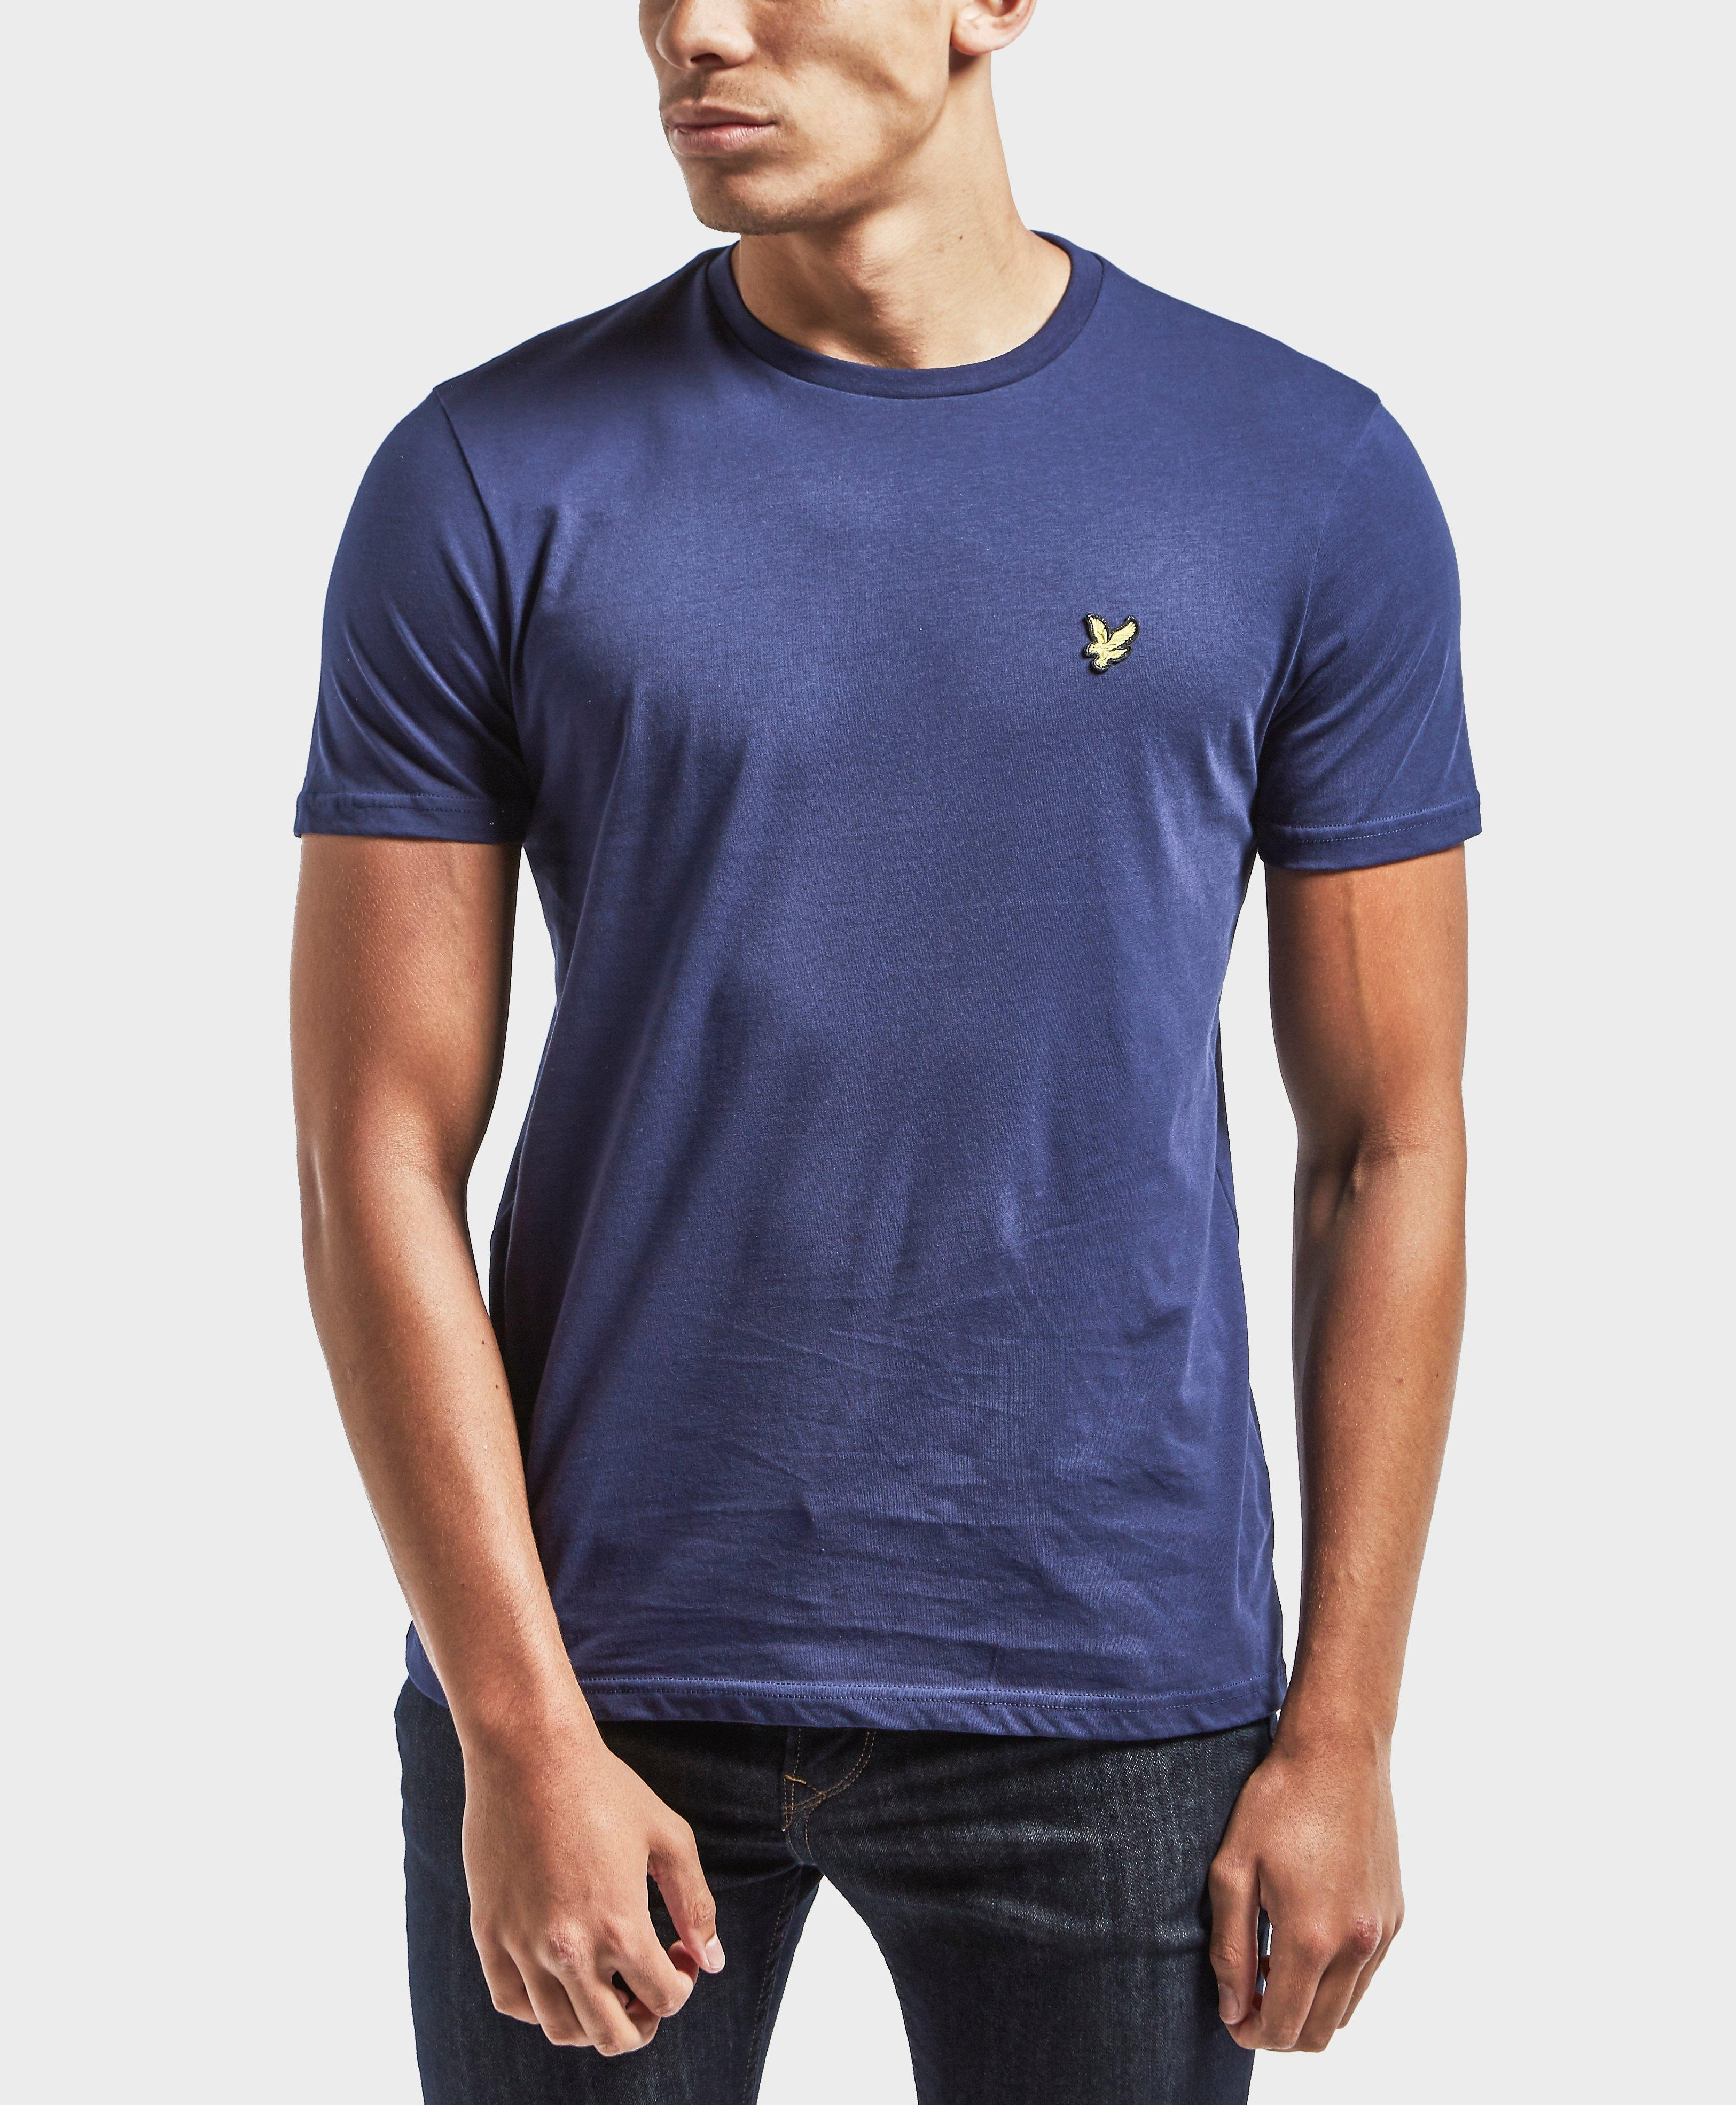 ee46397db Lyle & Scott Crew Neck T-shirt in Blue for Men - Lyst